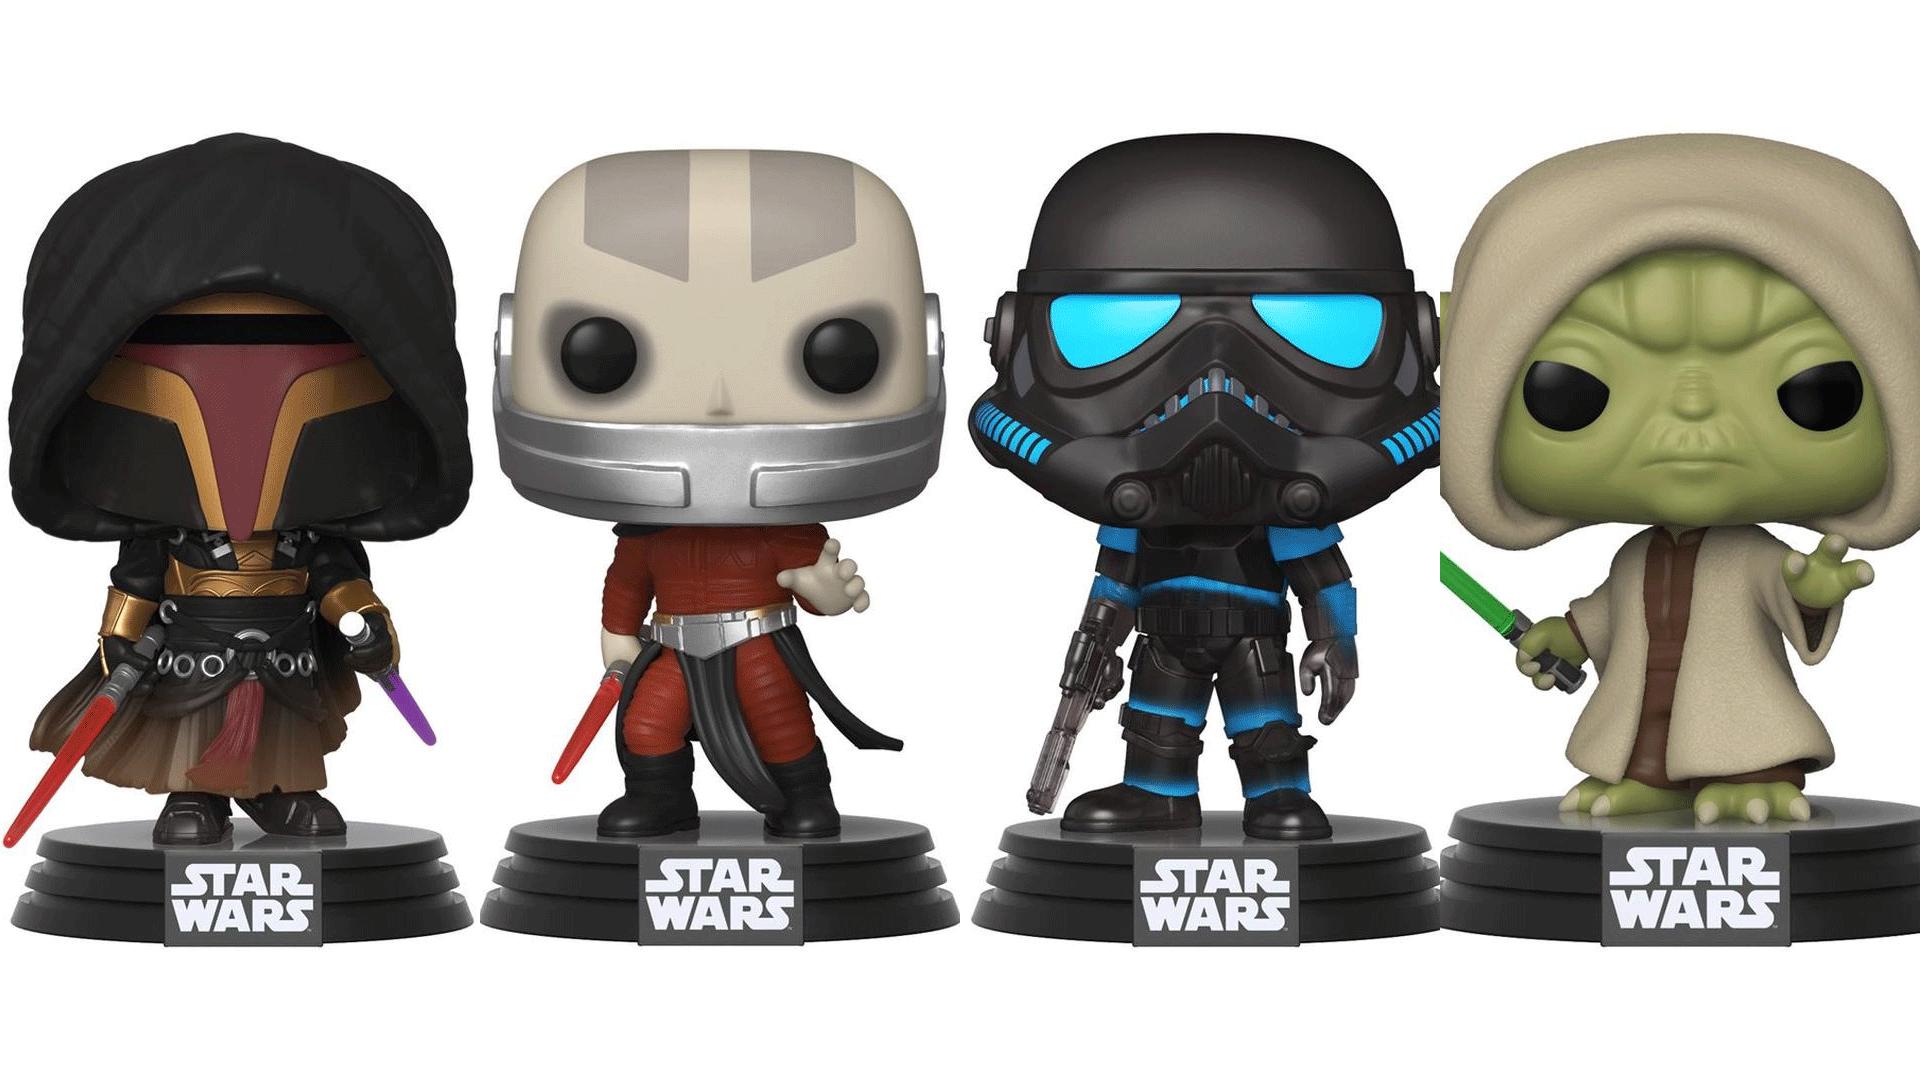 Funko Reveals Four Amazing New Pop Figures For Star Wars Fans Geektyrant